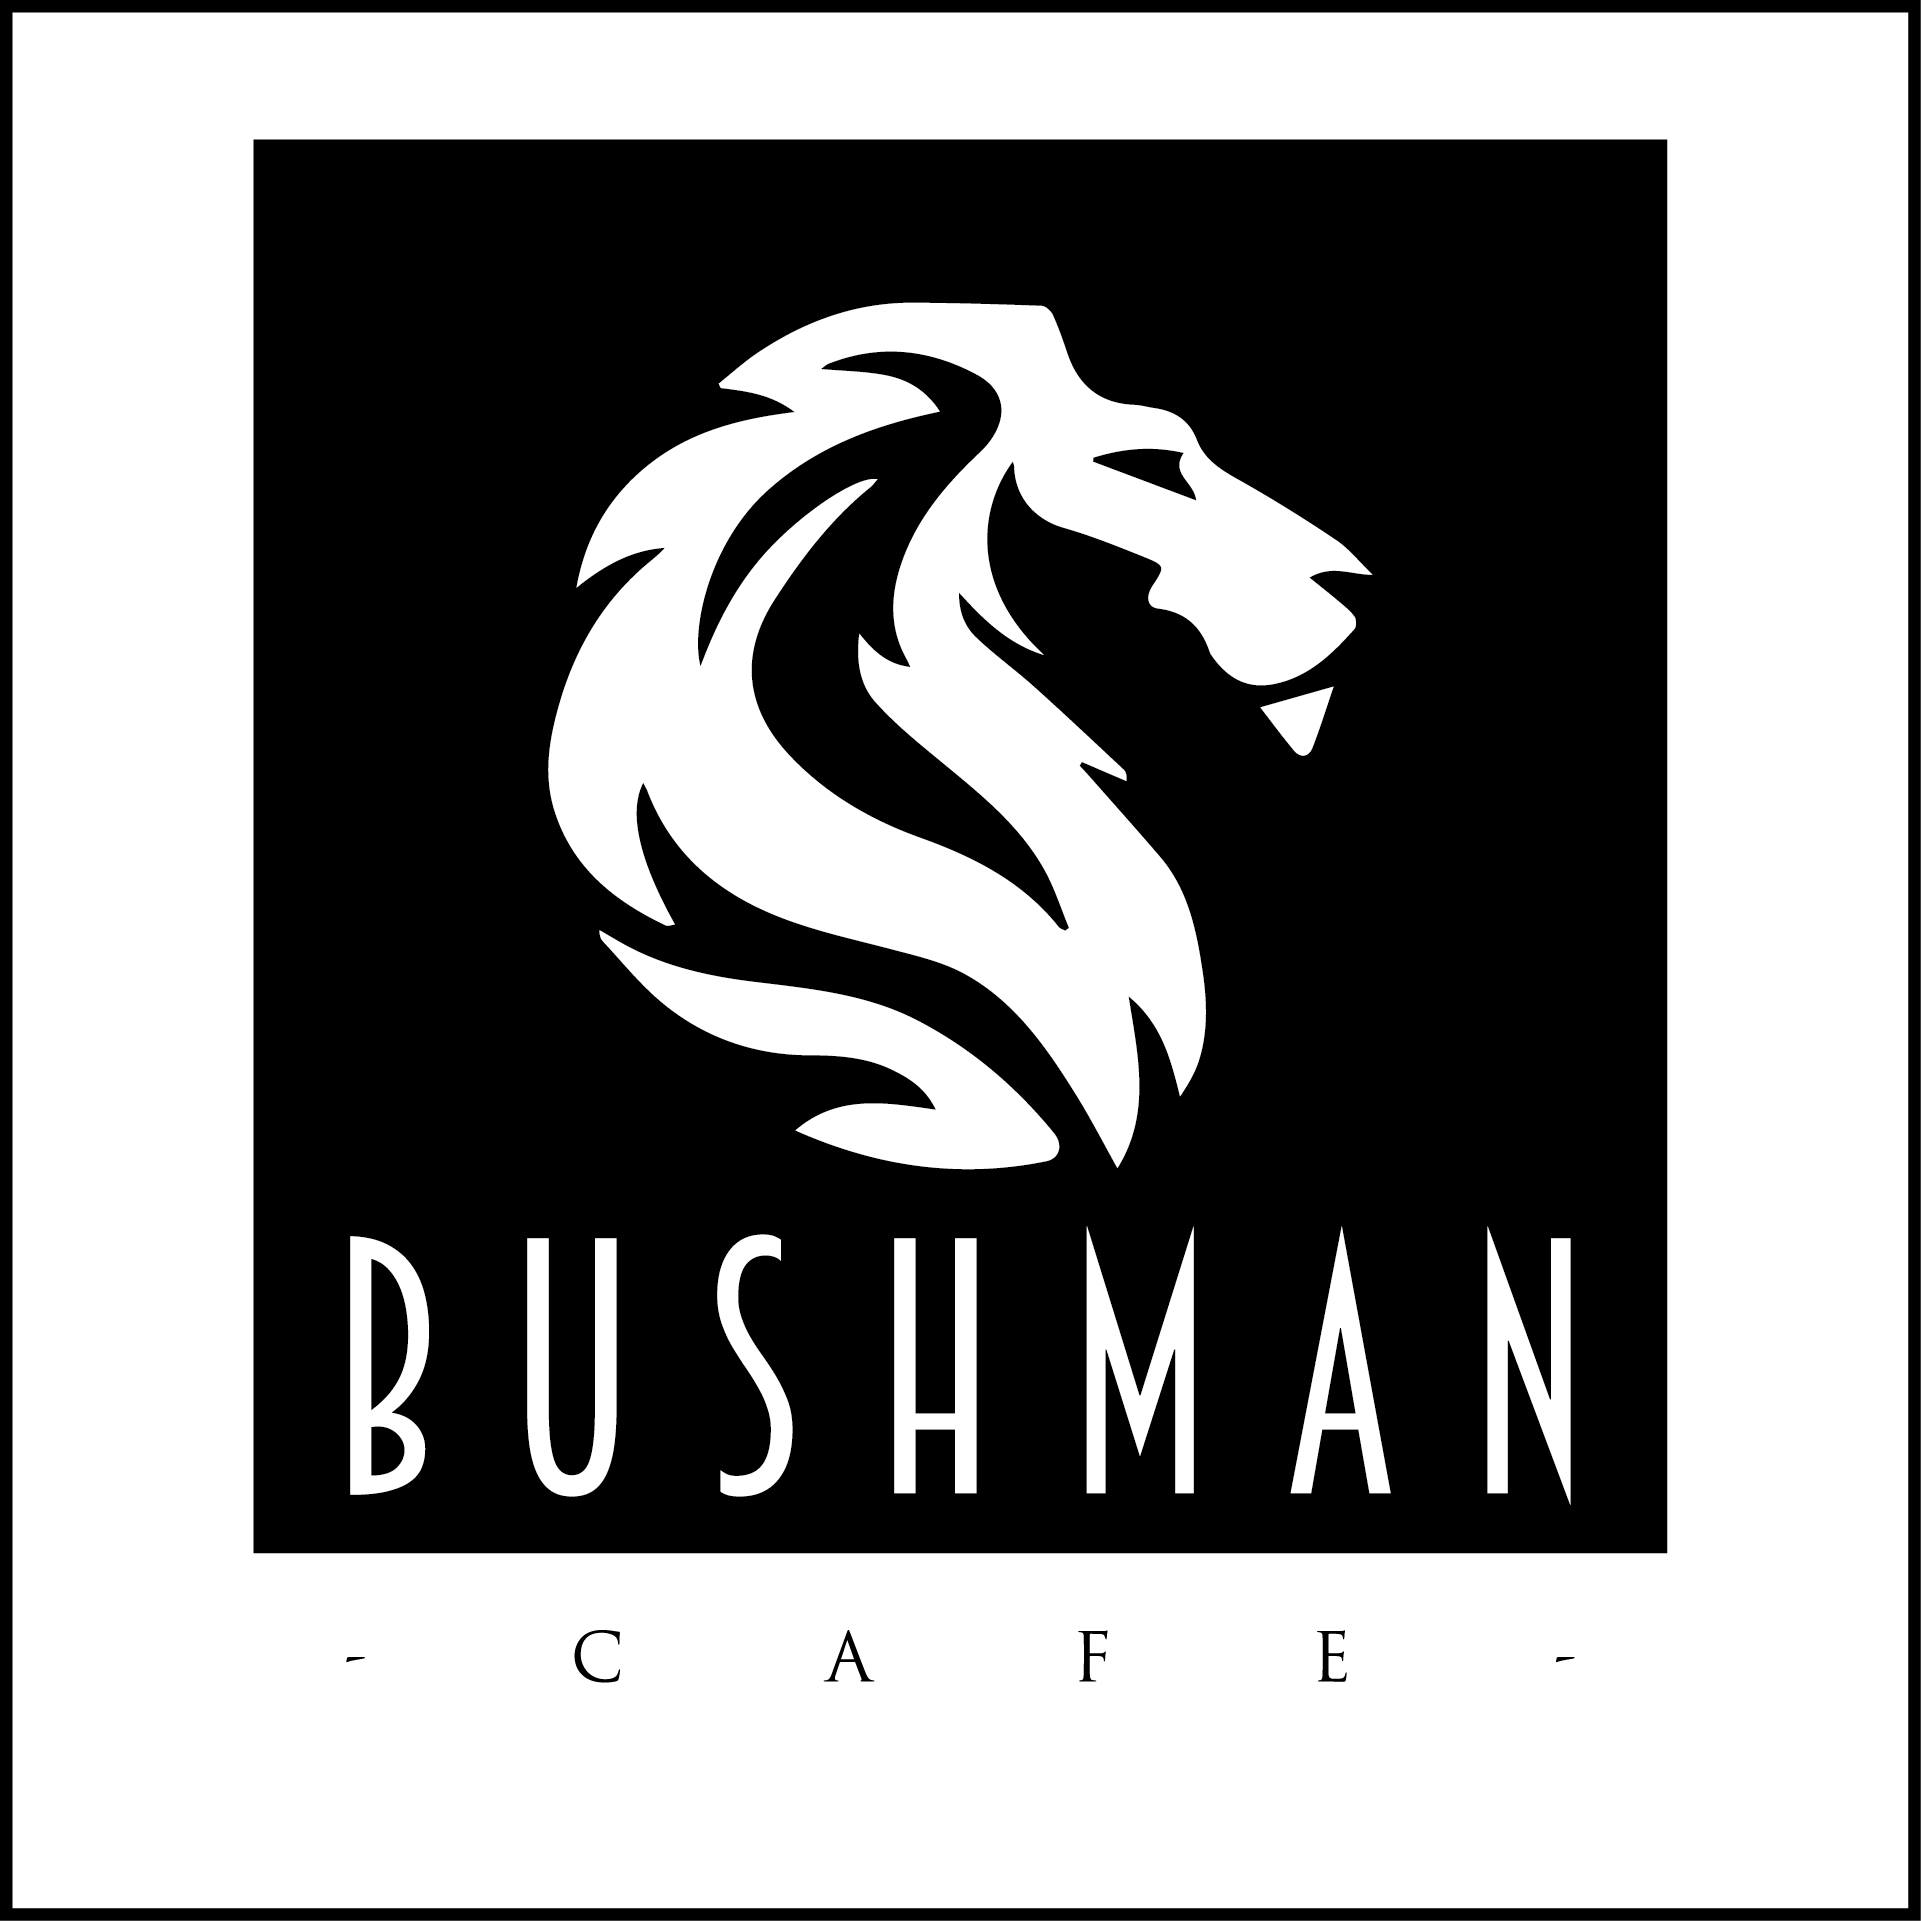 Bushman Café – Le Café Hotel